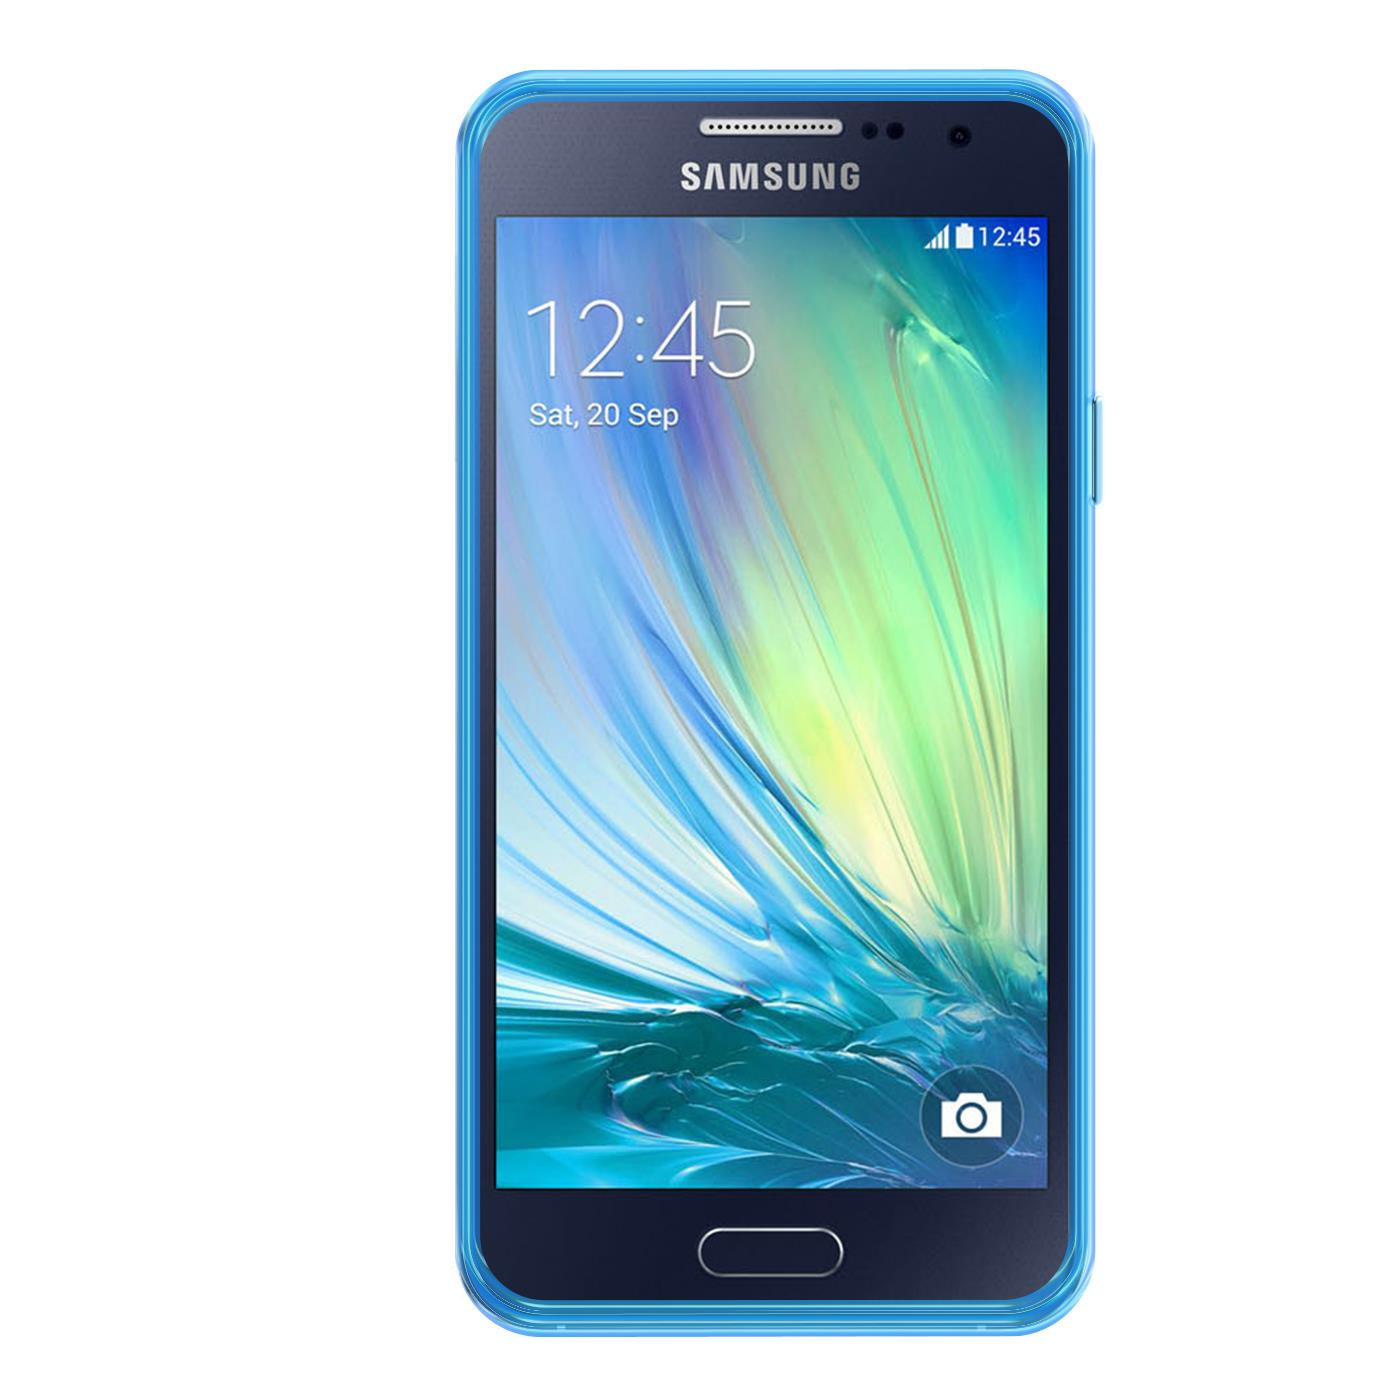 Samsung-Galaxy-A3-2015-Thin-Silicone-Clear-Case-Cover-Ultra-Slim-Shockproof-Gel Indexbild 7